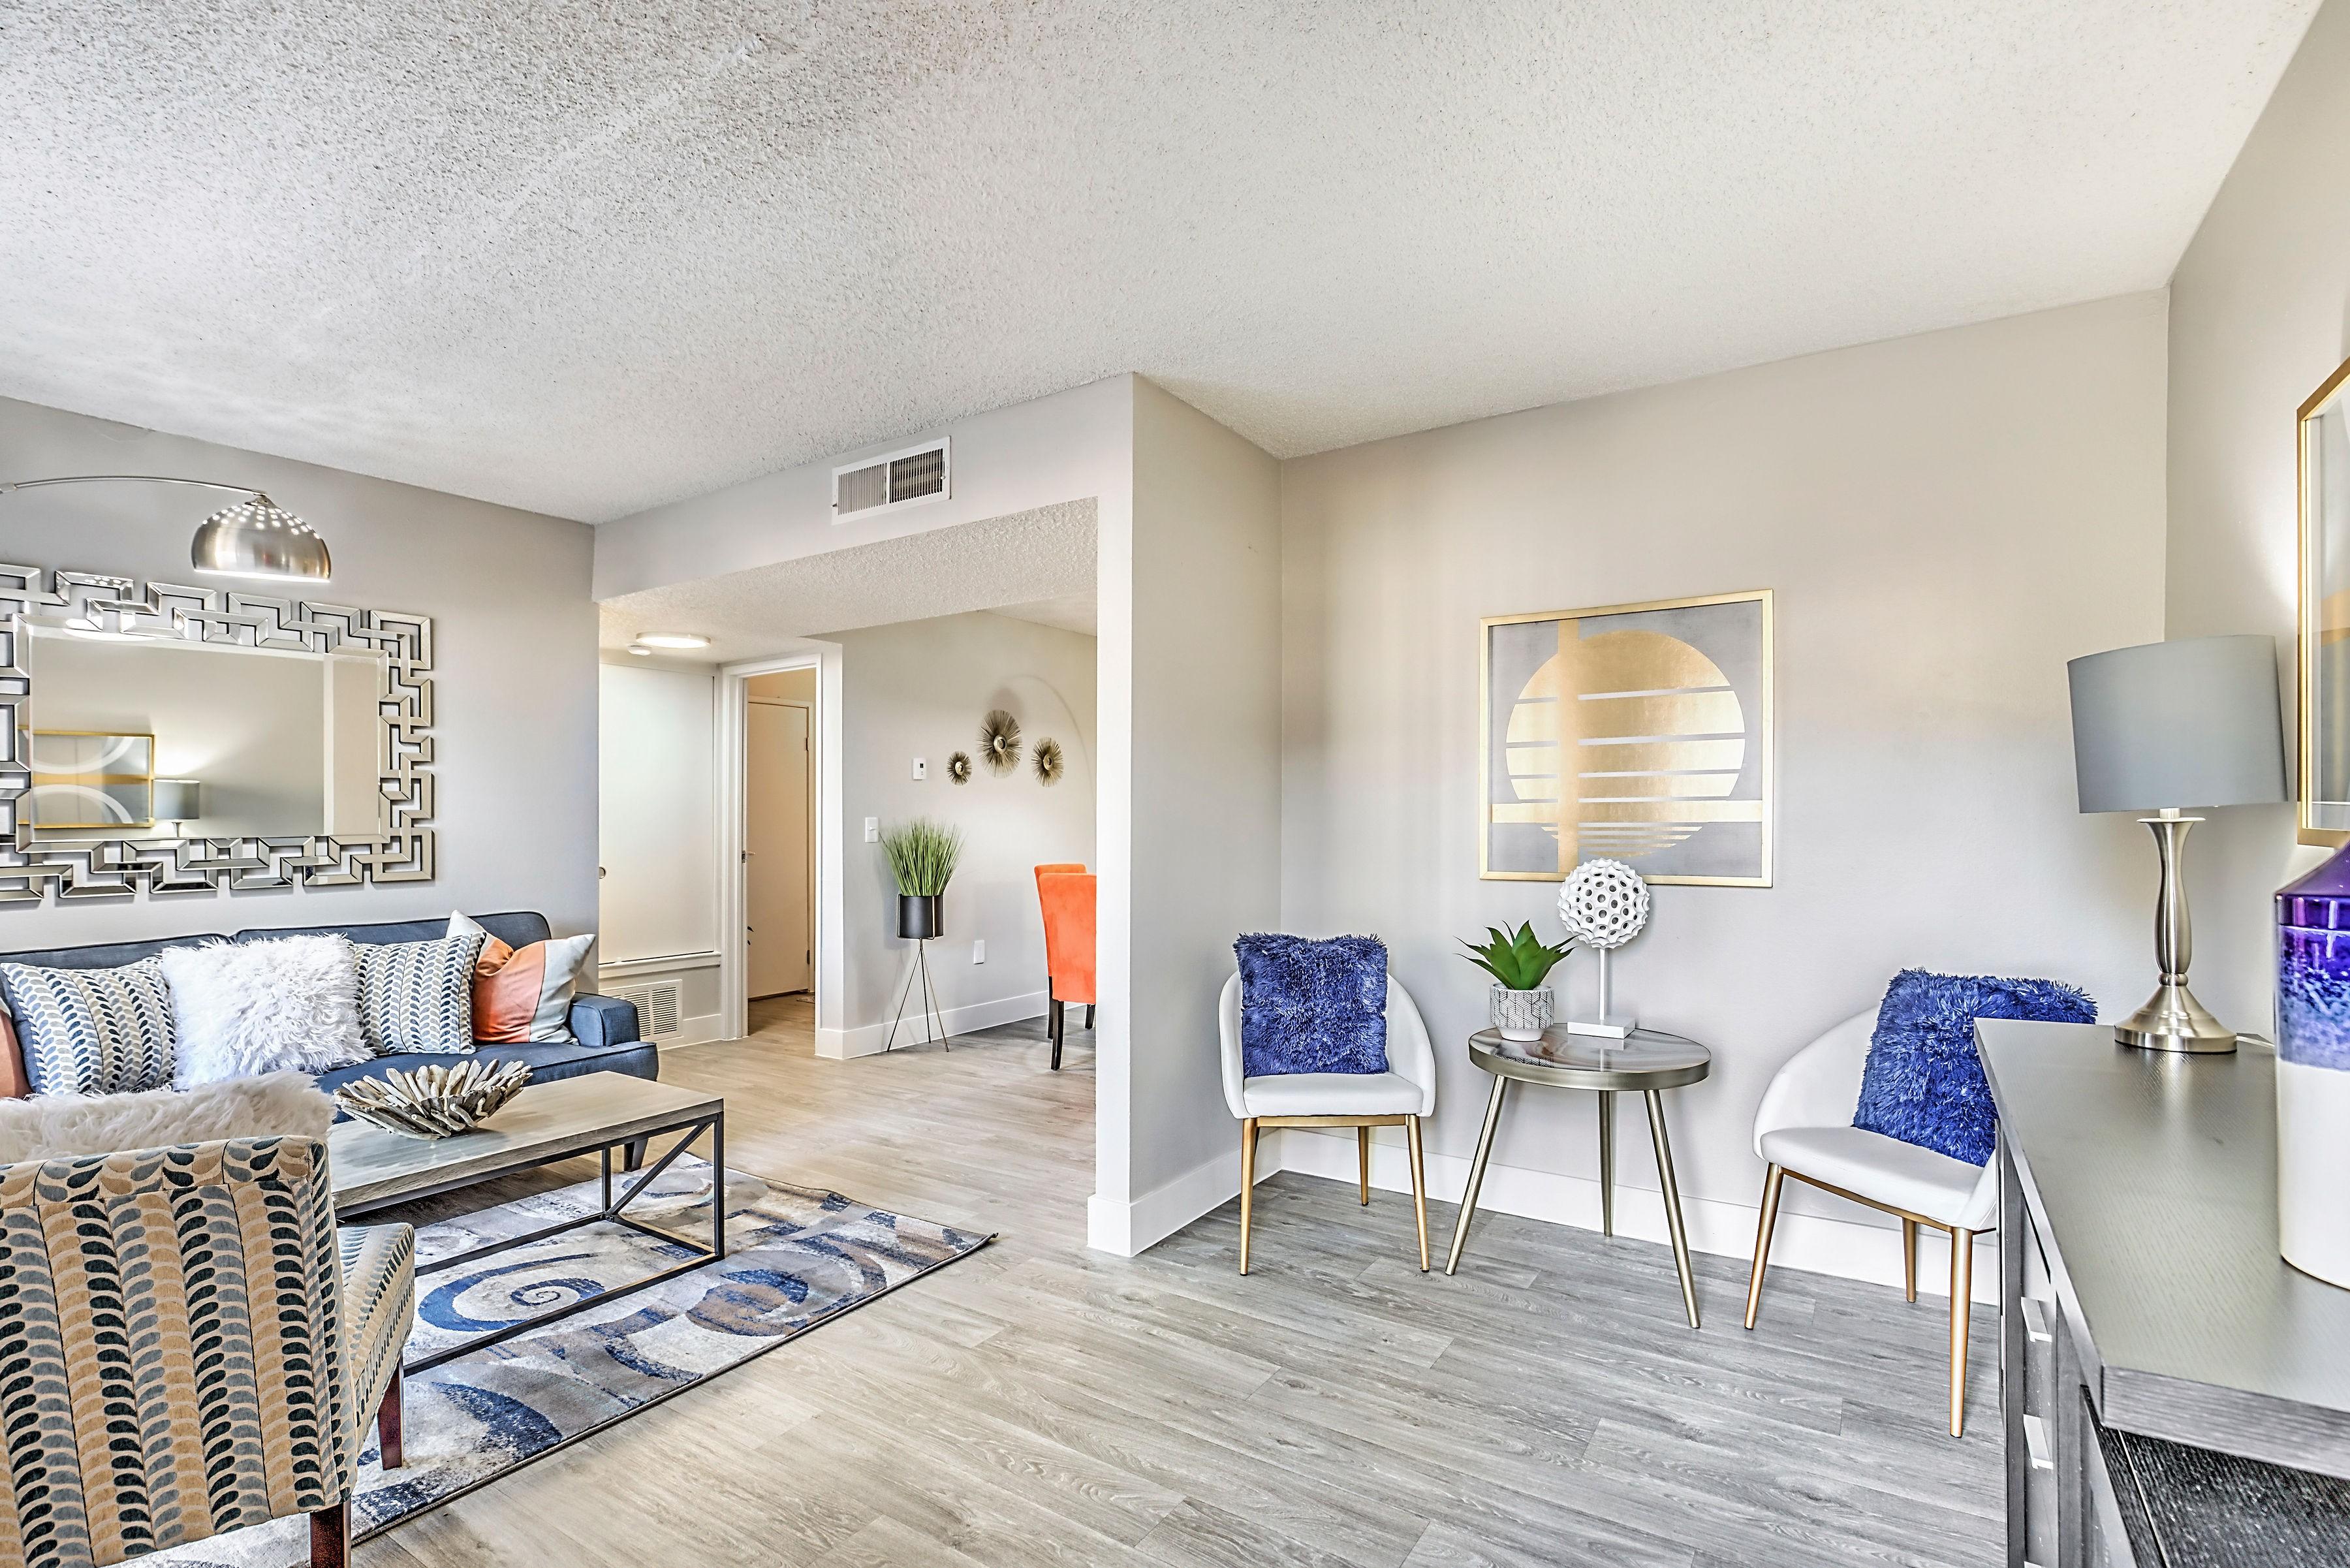 Apartments Near Las Vegas Accent on Decatur for Las Vegas Students in Las Vegas, NV